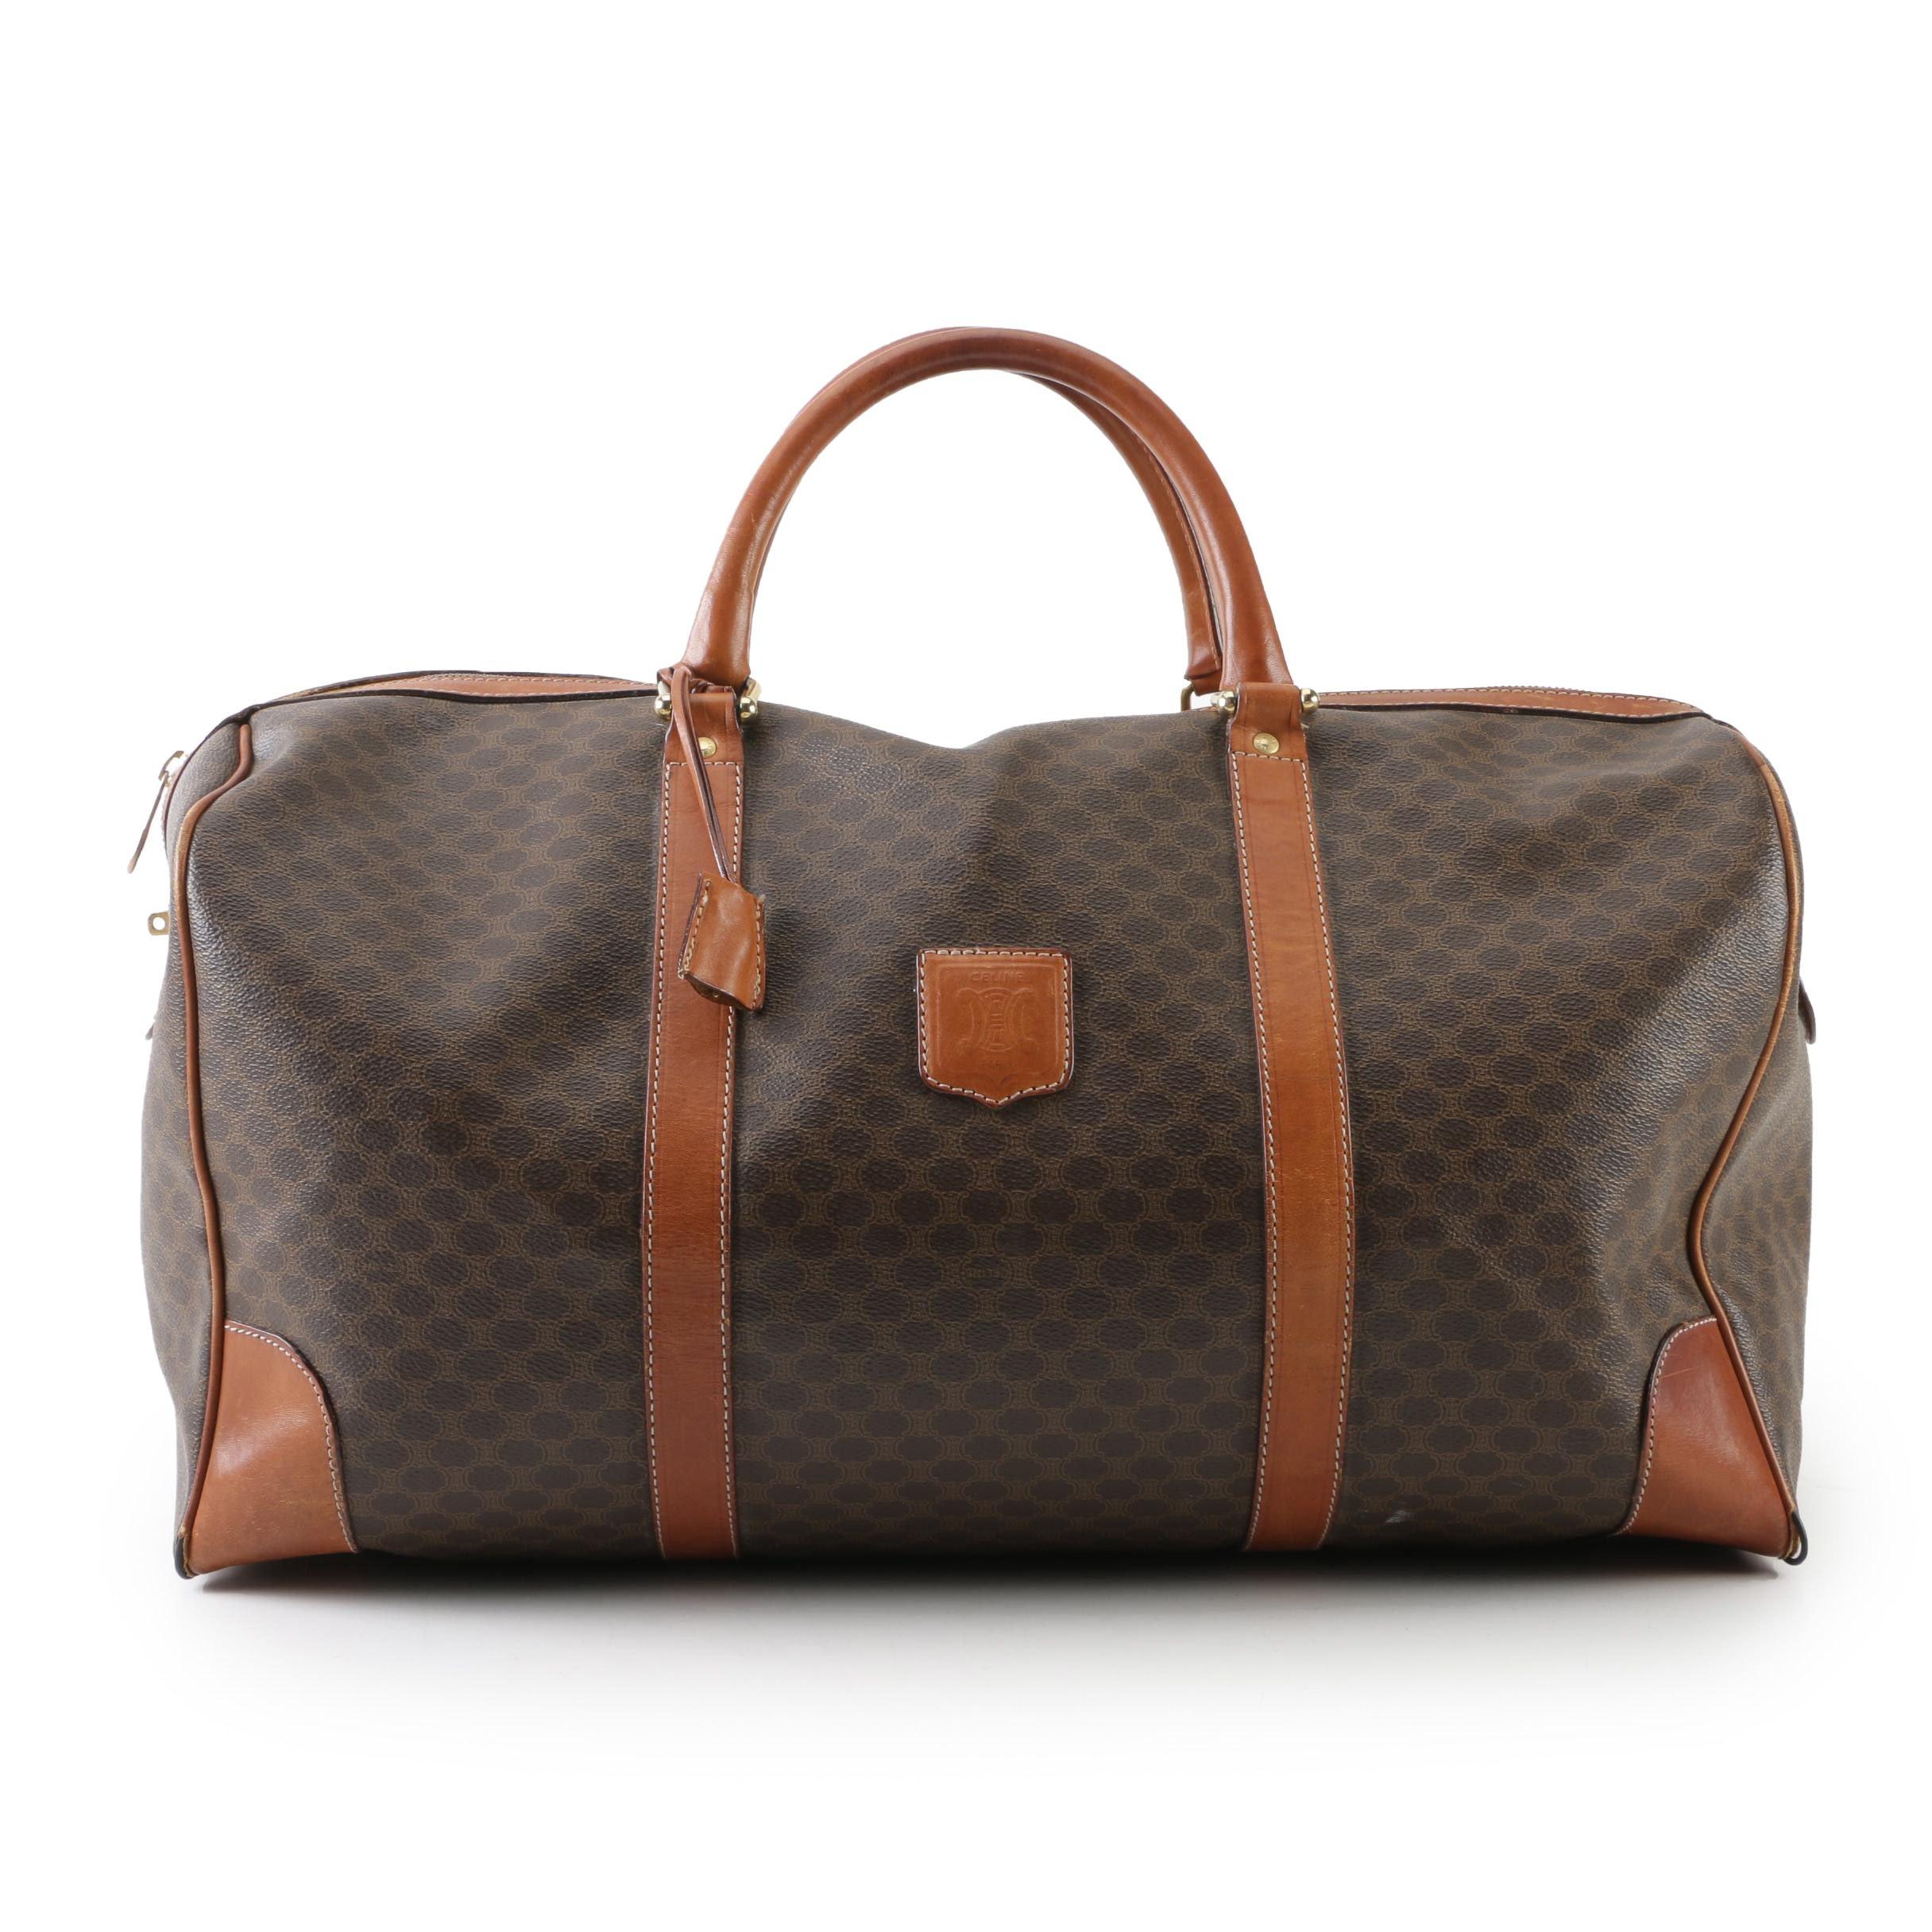 Vintage Céline Paris Macadam Boston Weekender Bag with Leather Trim